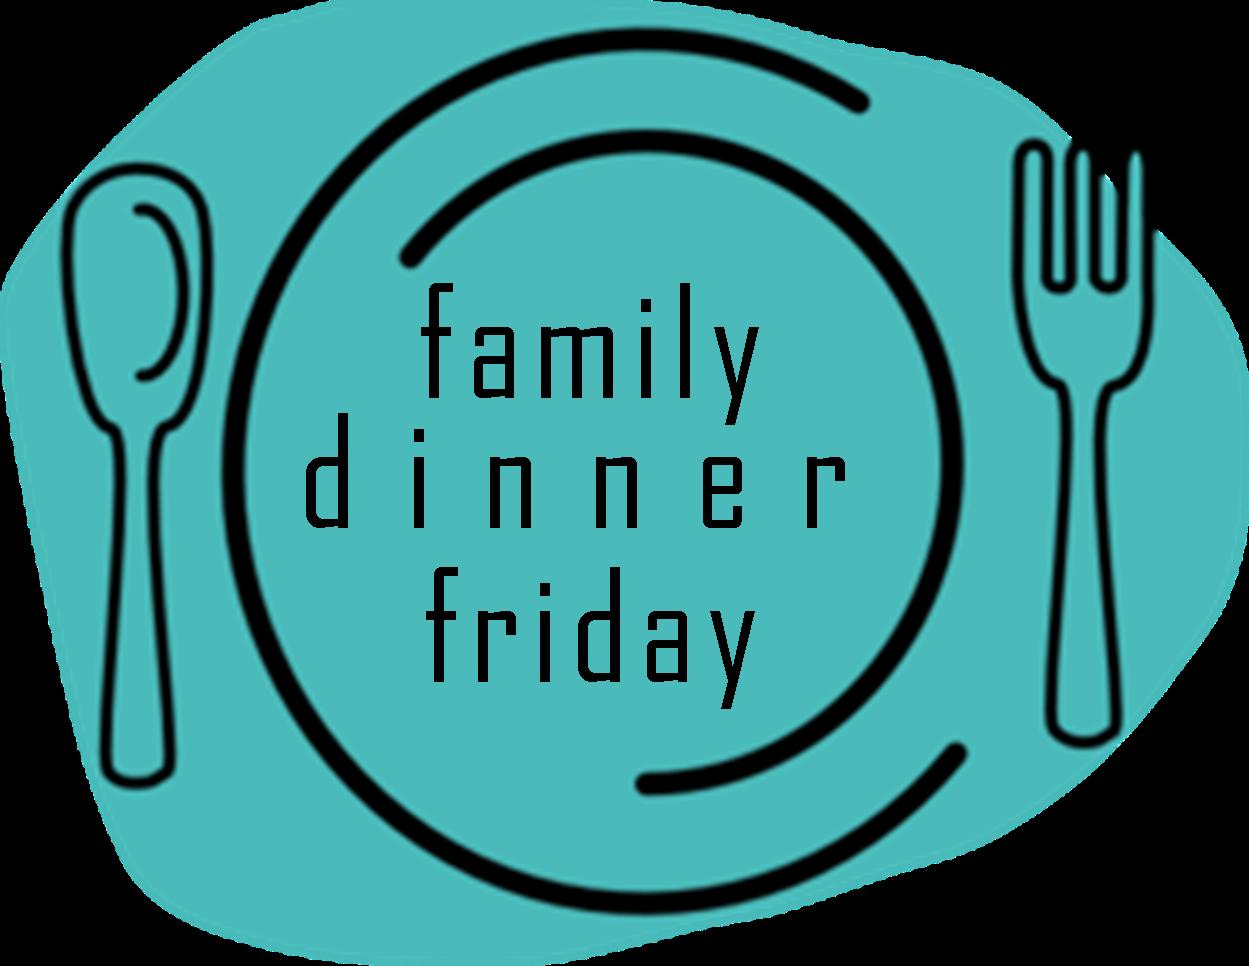 Clipart restaurant family dinner time. Redding first families friday